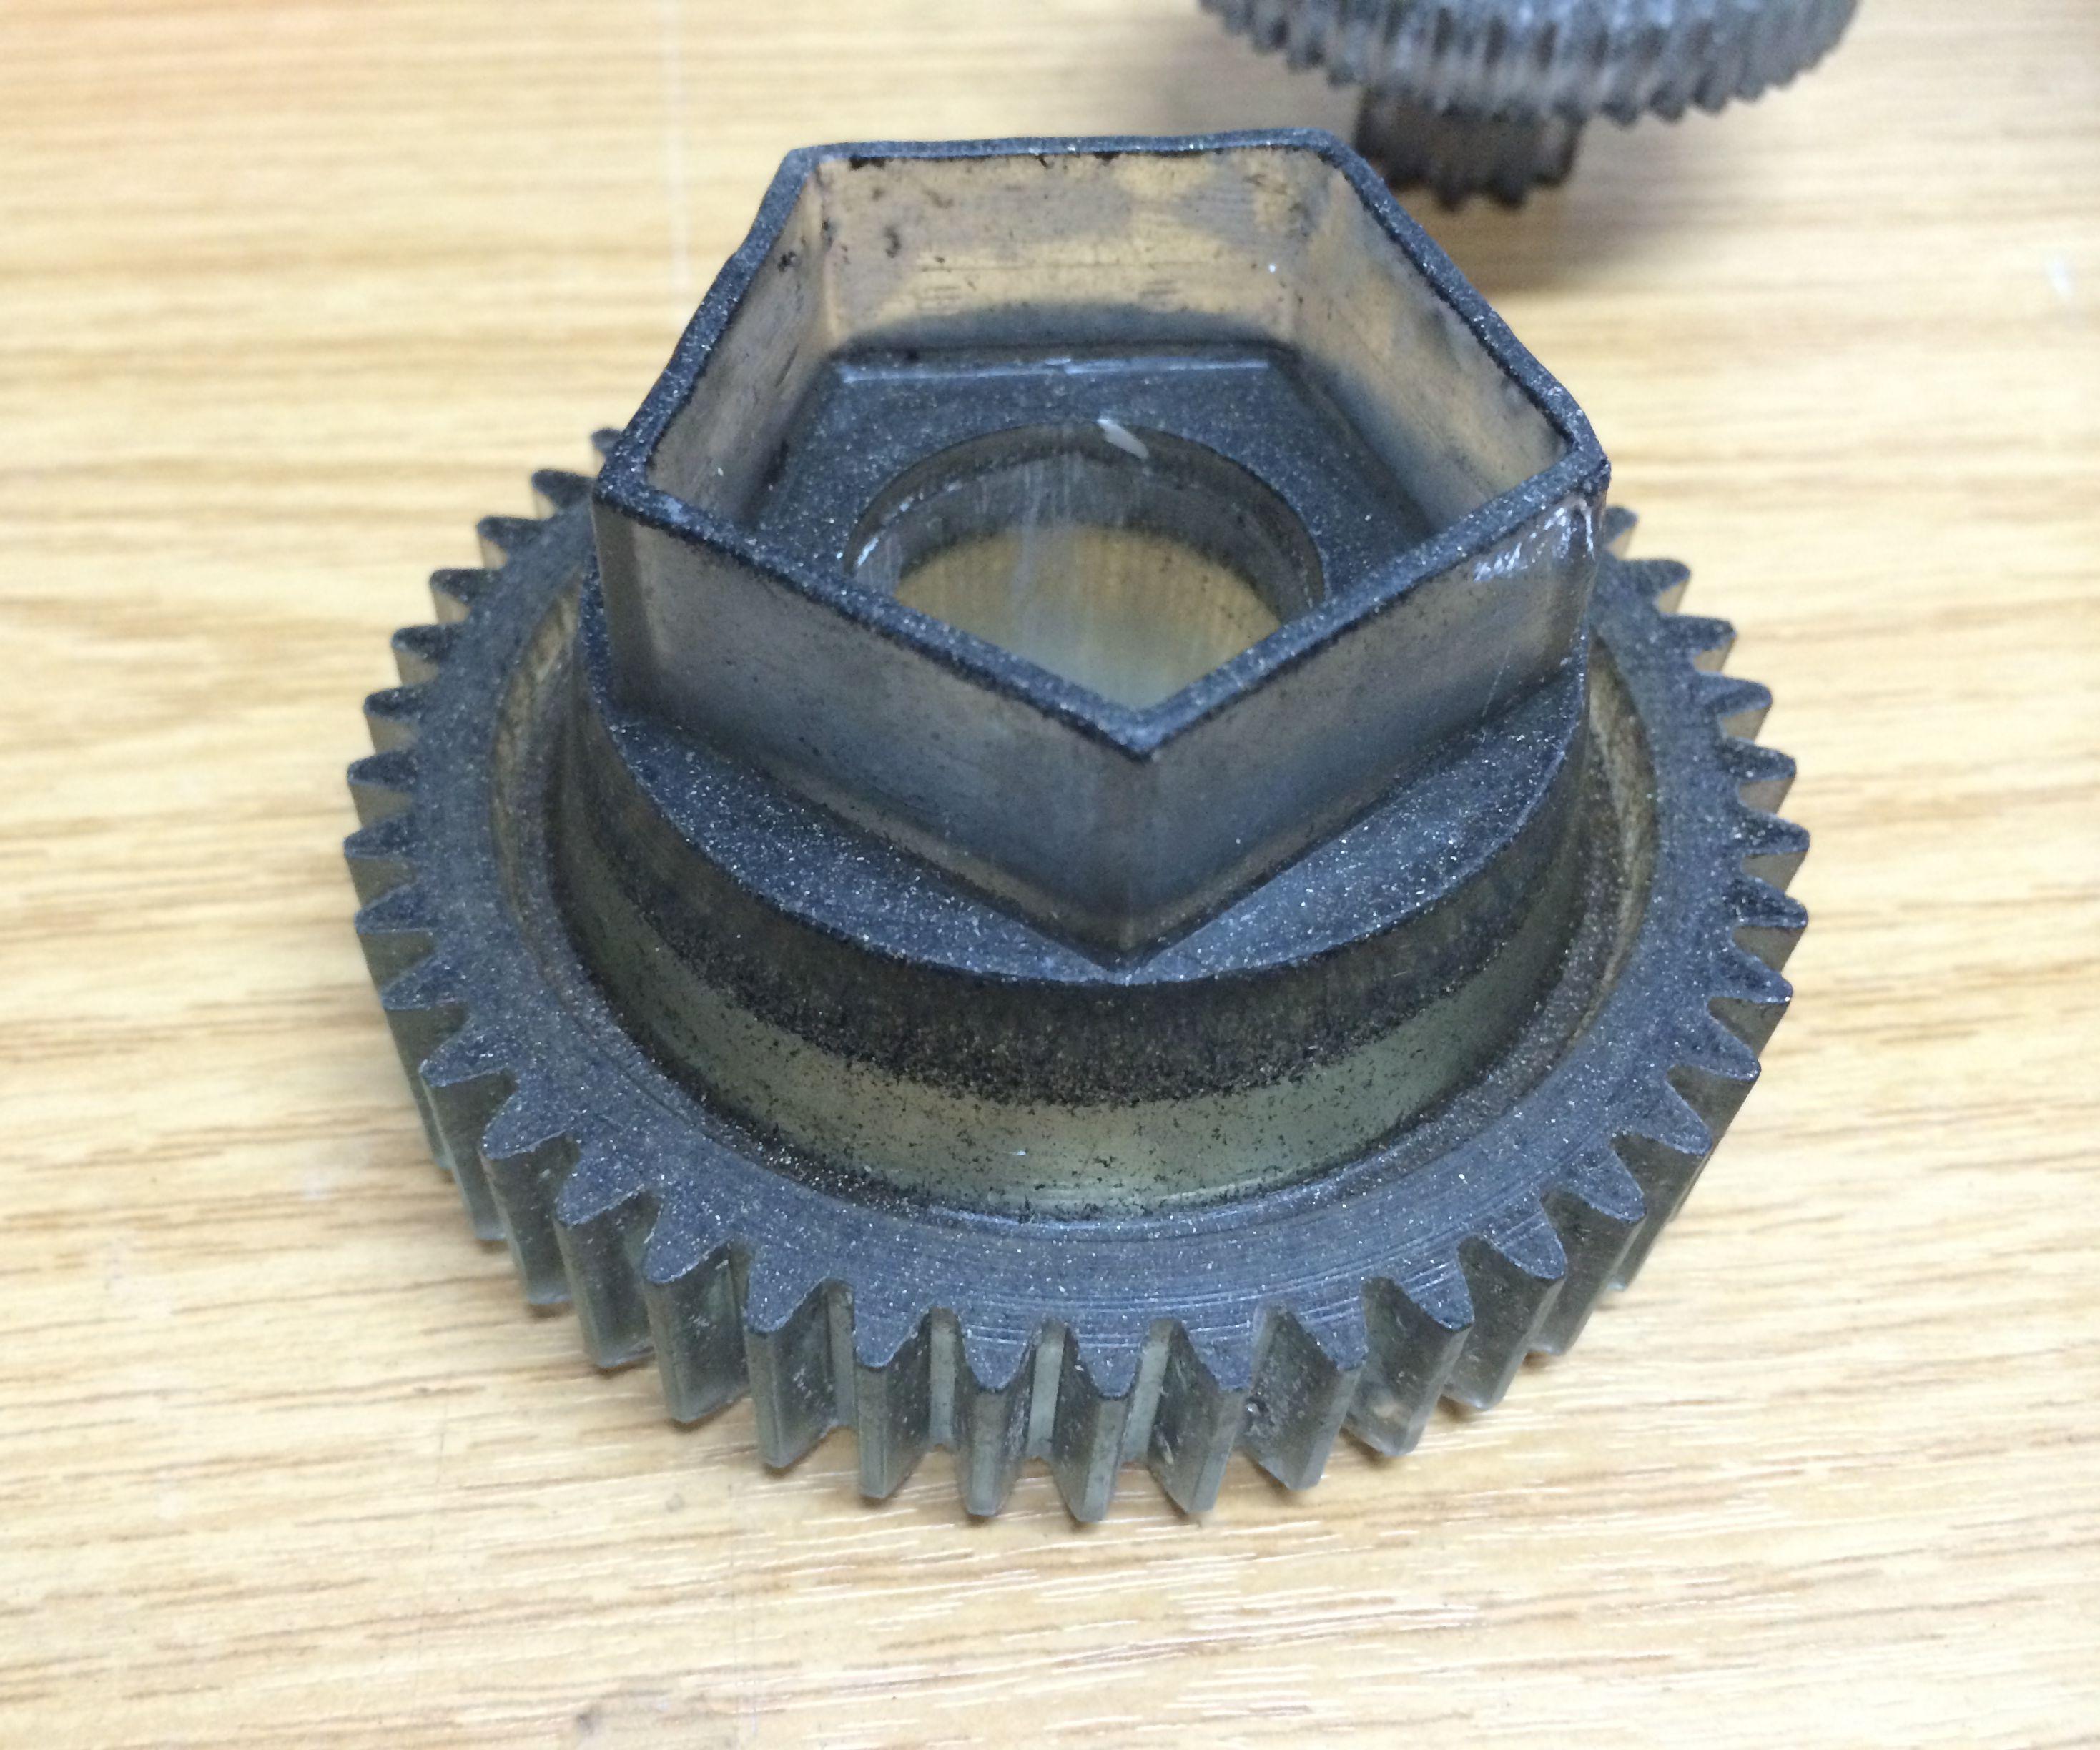 resin casting gears for power wheels